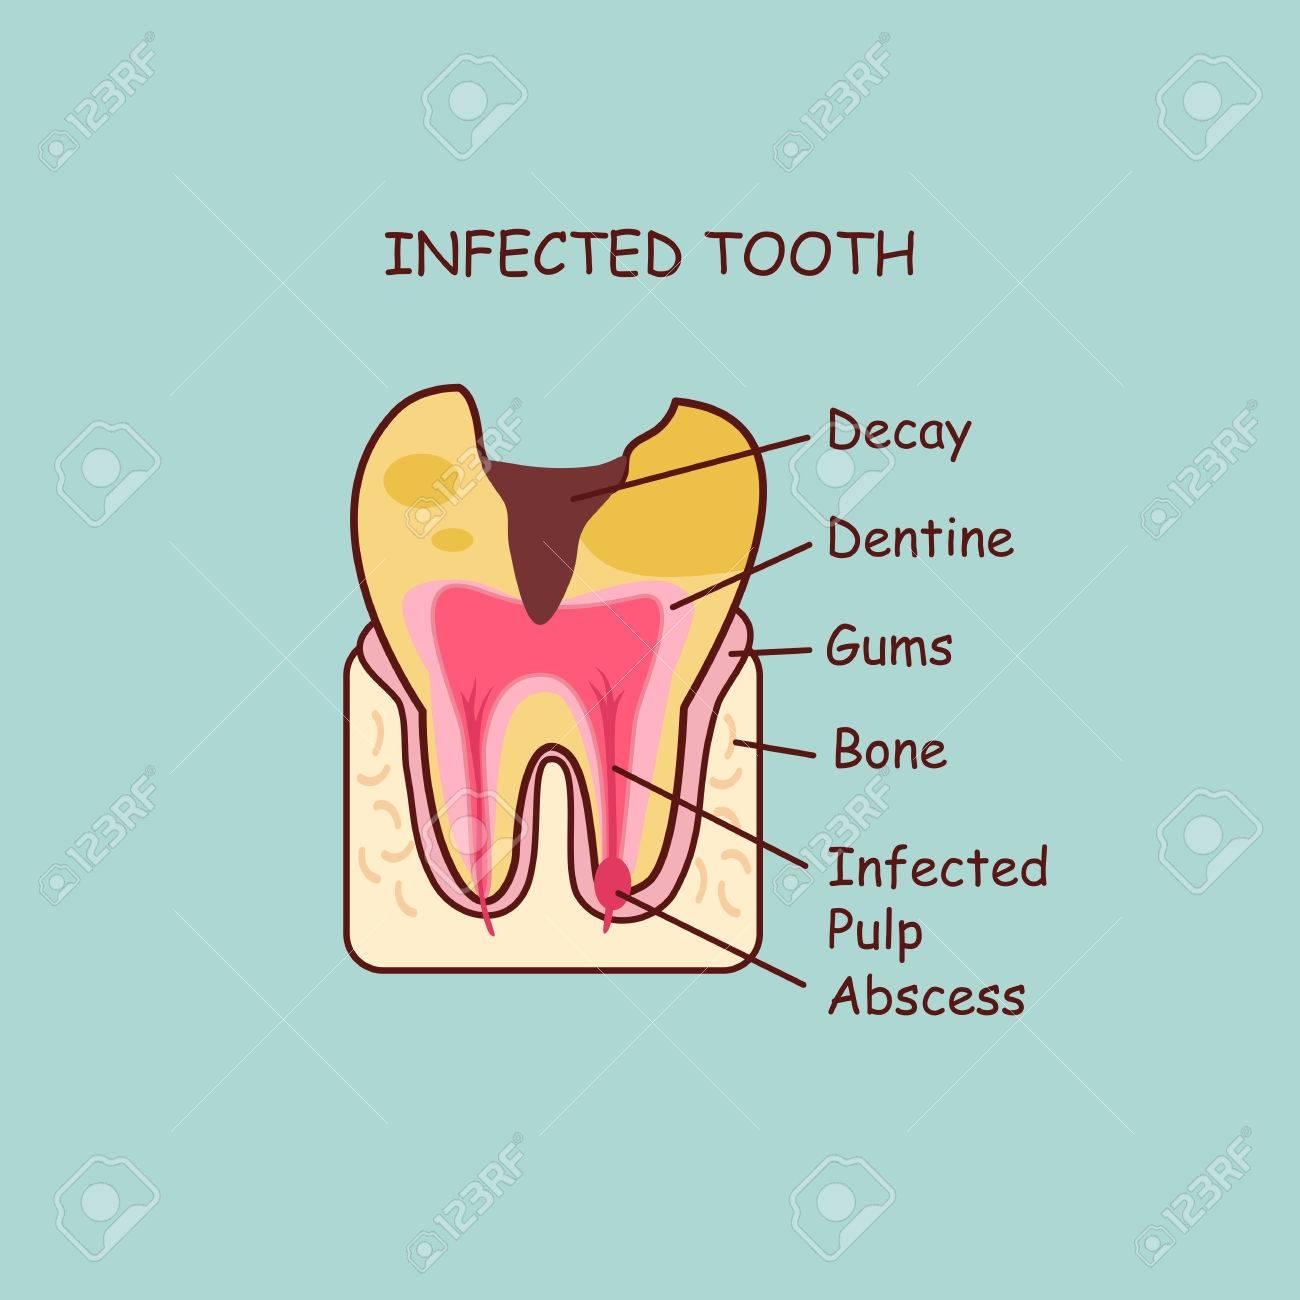 Anatomía Dental Dibujos Animados Diente Infectado, Gran Concepto De ...